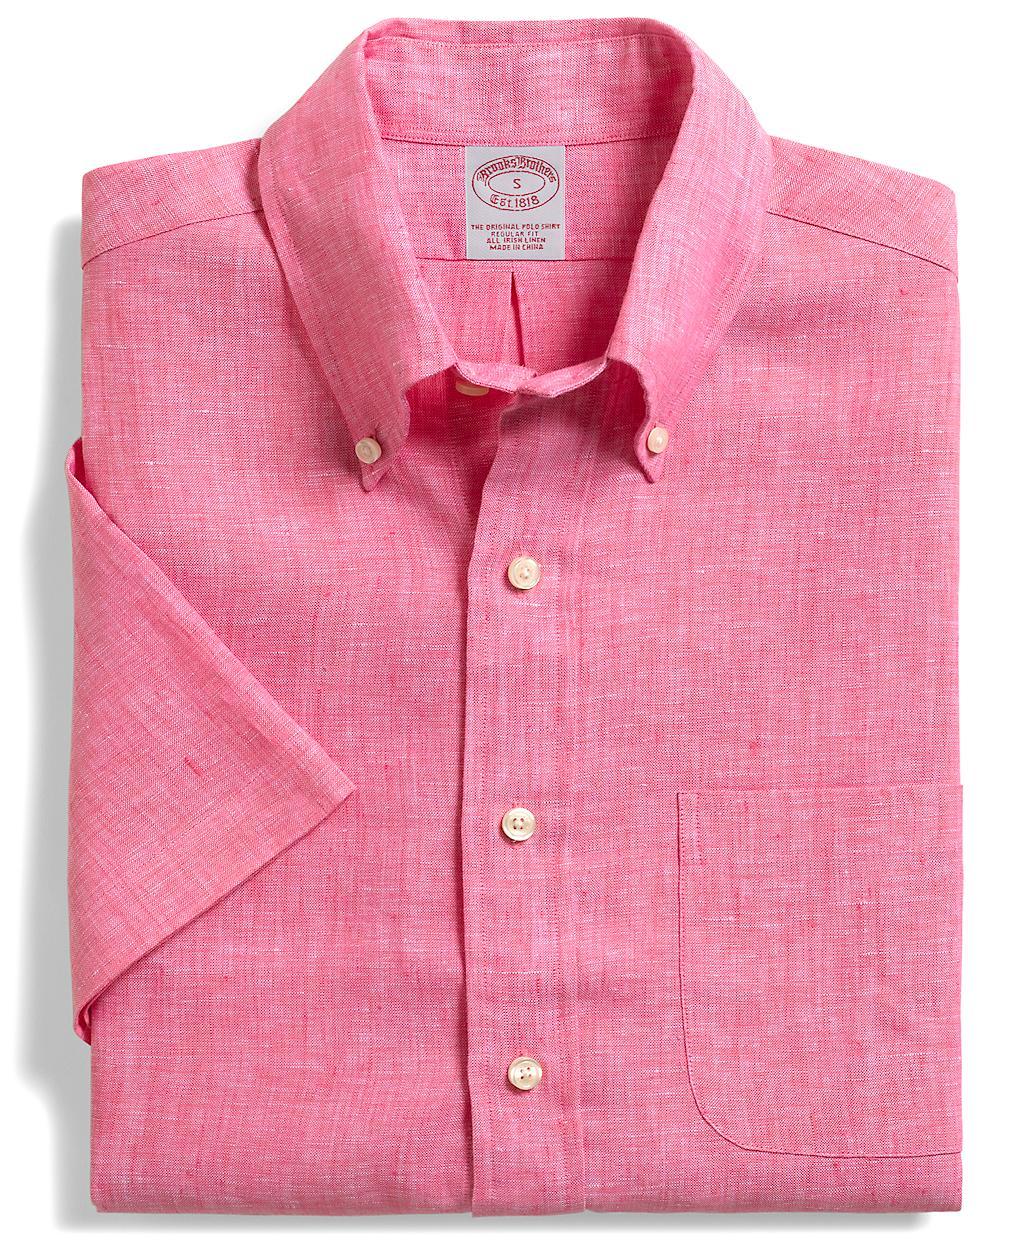 Brooks brothers regular fit irish linen short sleeve sport Brooks brothers shirt size guide